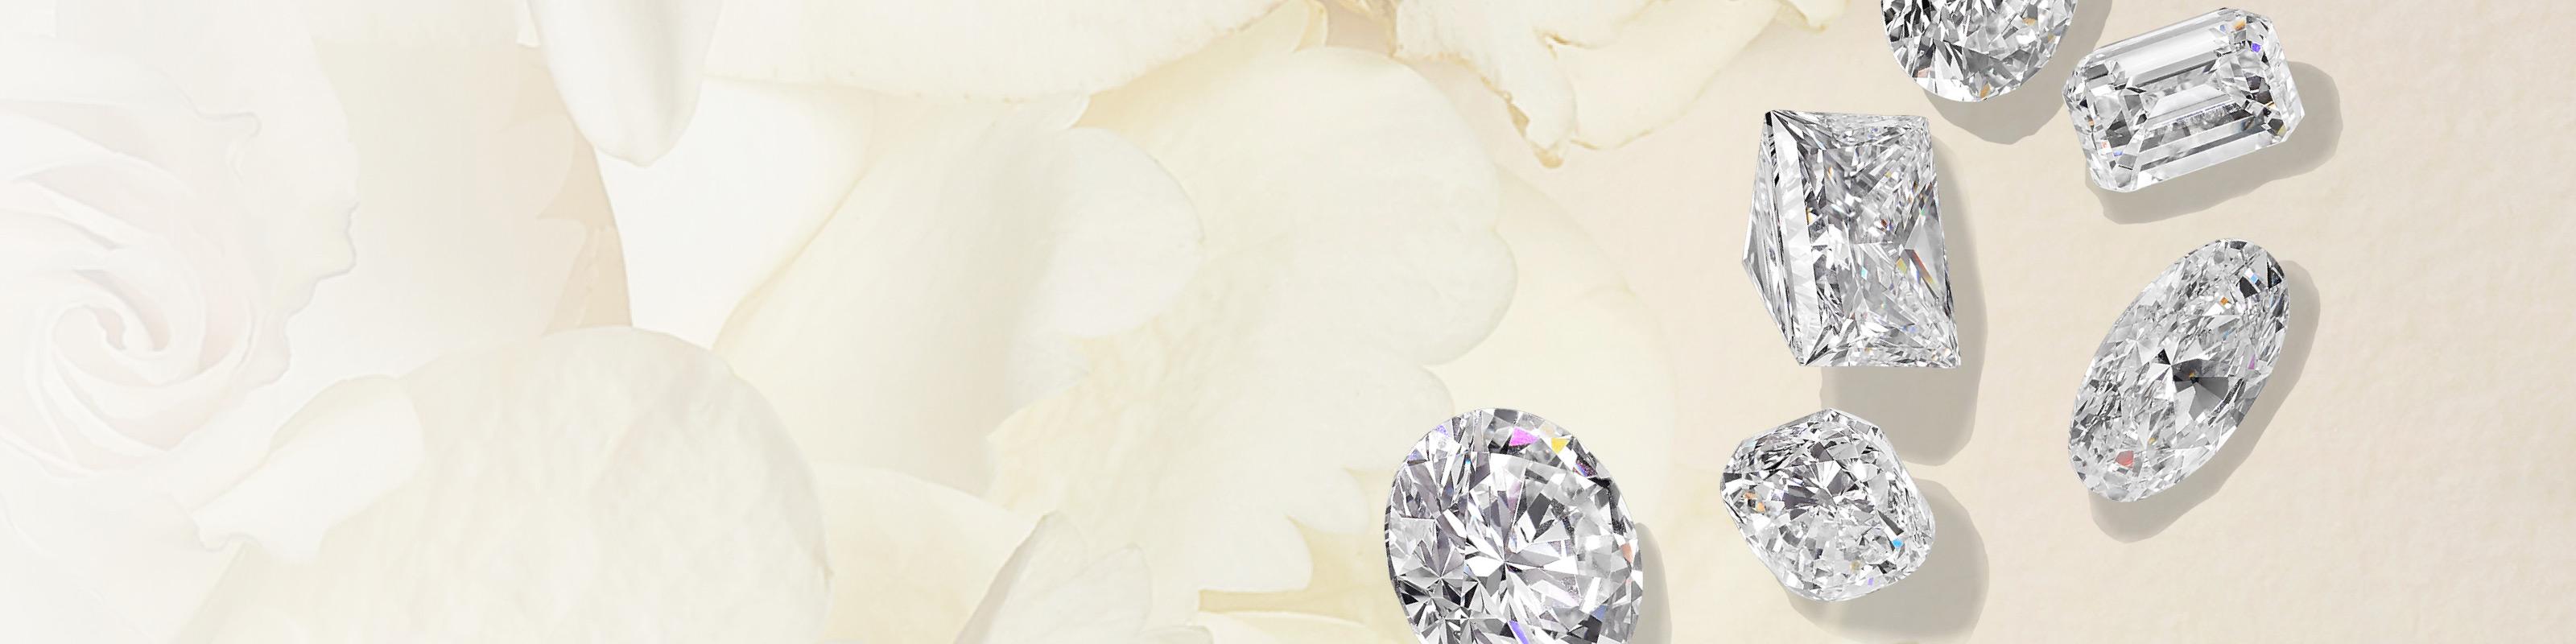 Loose diamonds and diamond jewelry by Jared